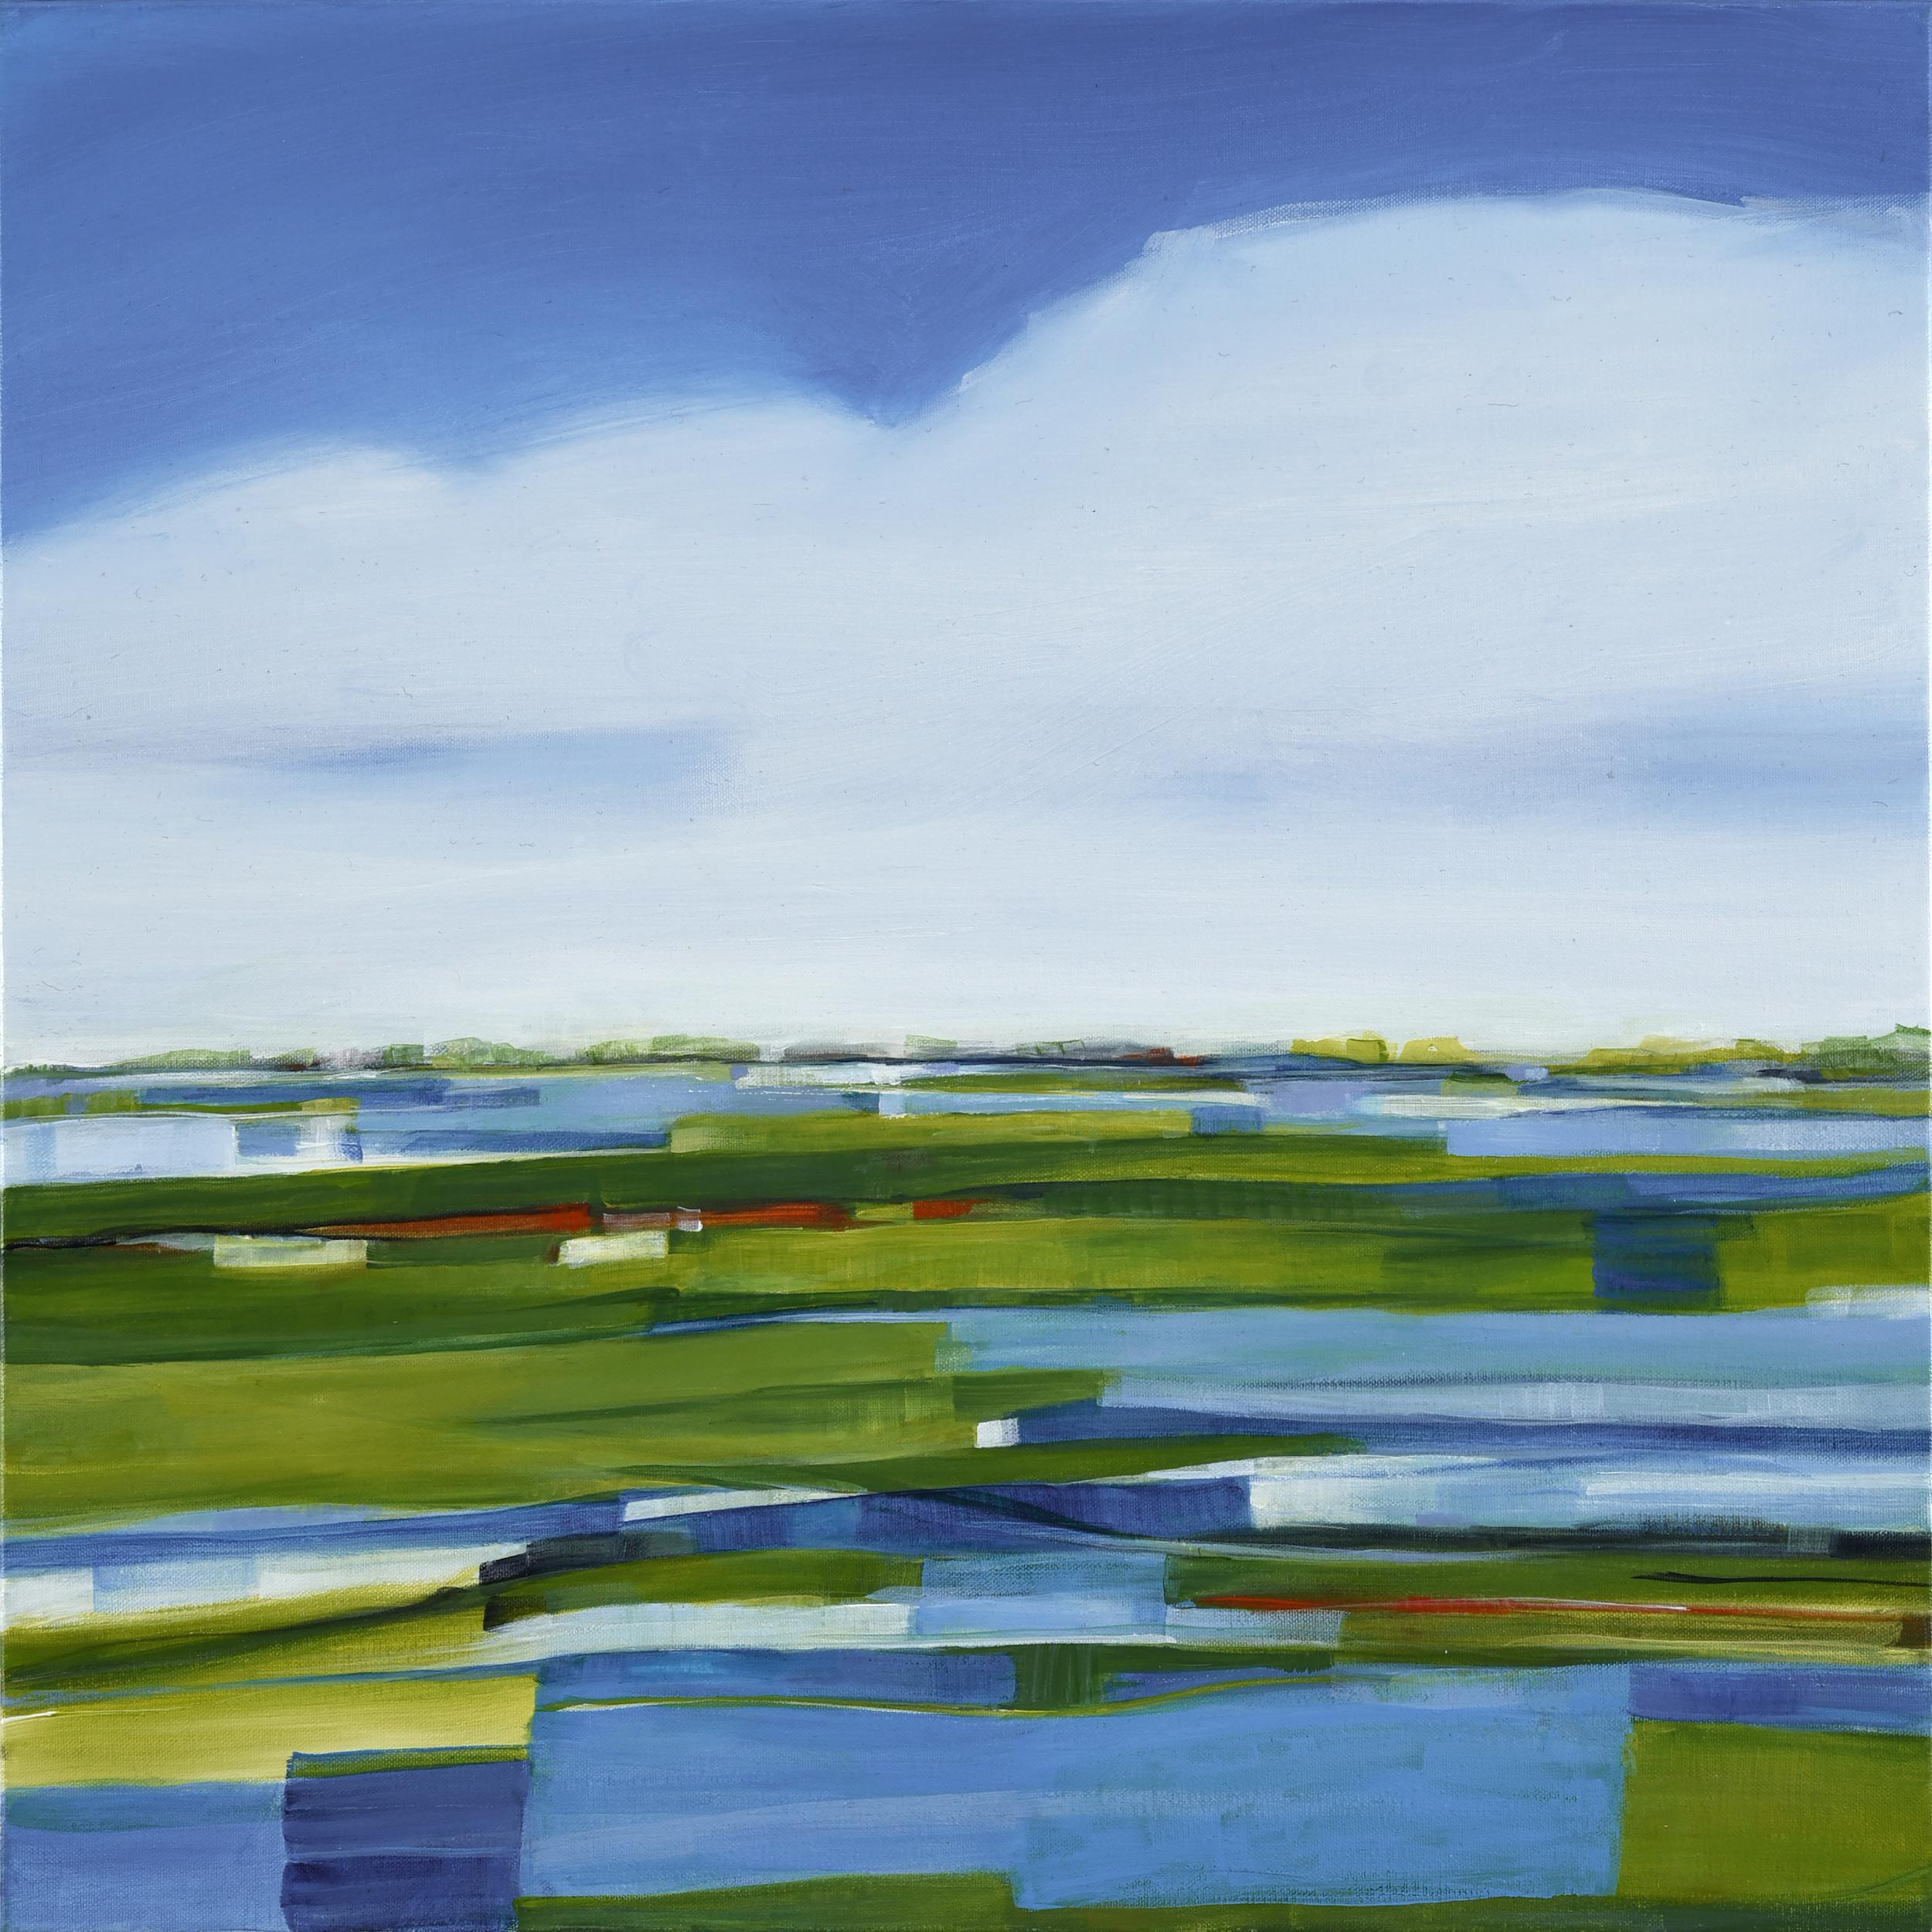 Music of the Marsh, Acrylic on Canvas, 24 x 24